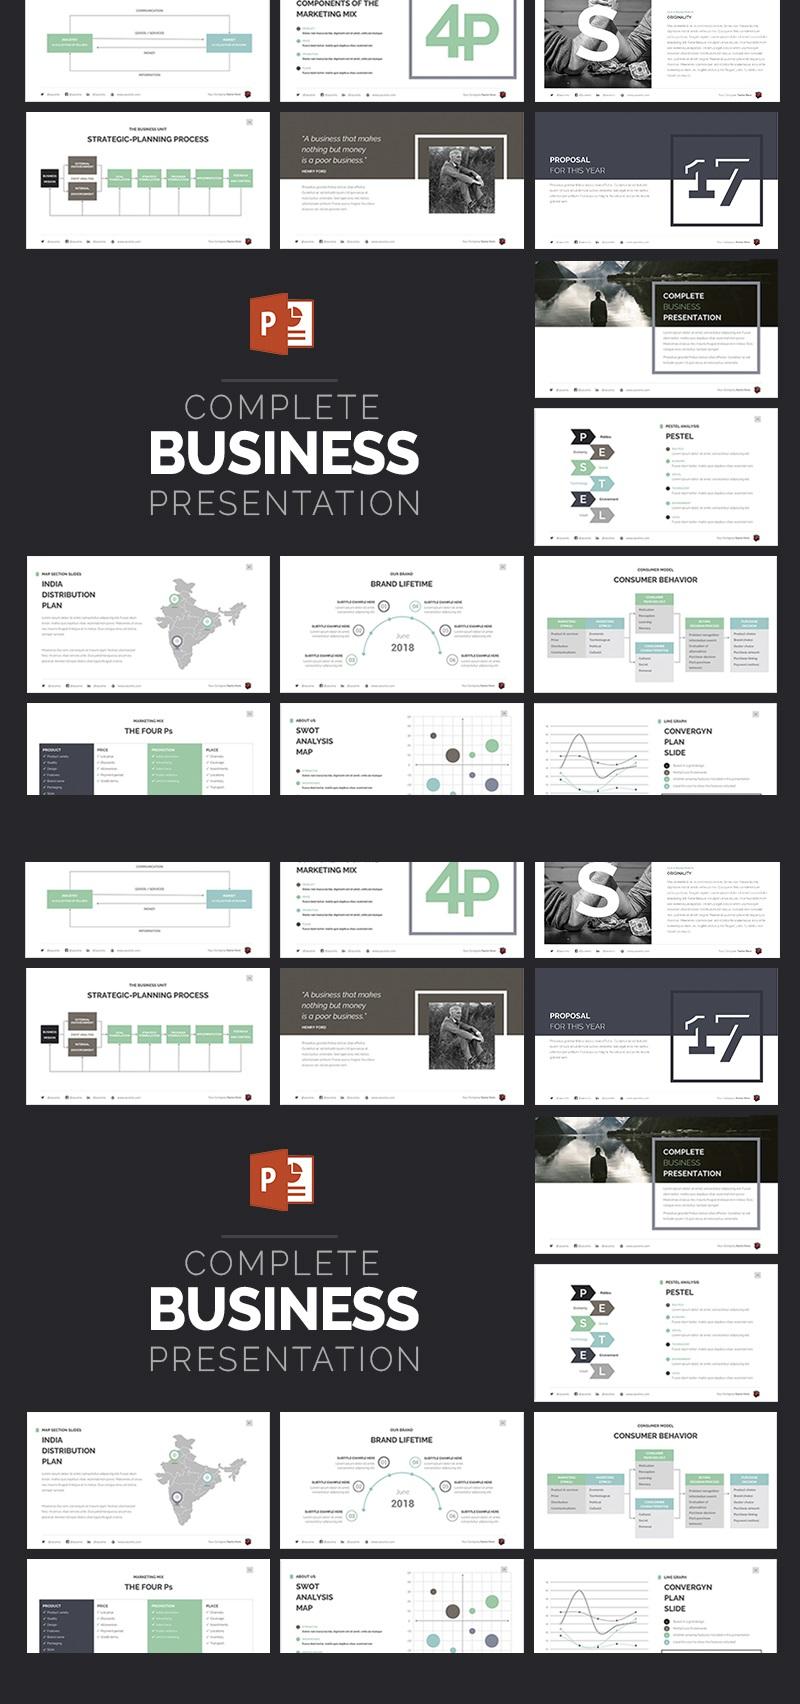 Szablon PowerPoint Complete Business Presentation #63510 - zrzut ekranu